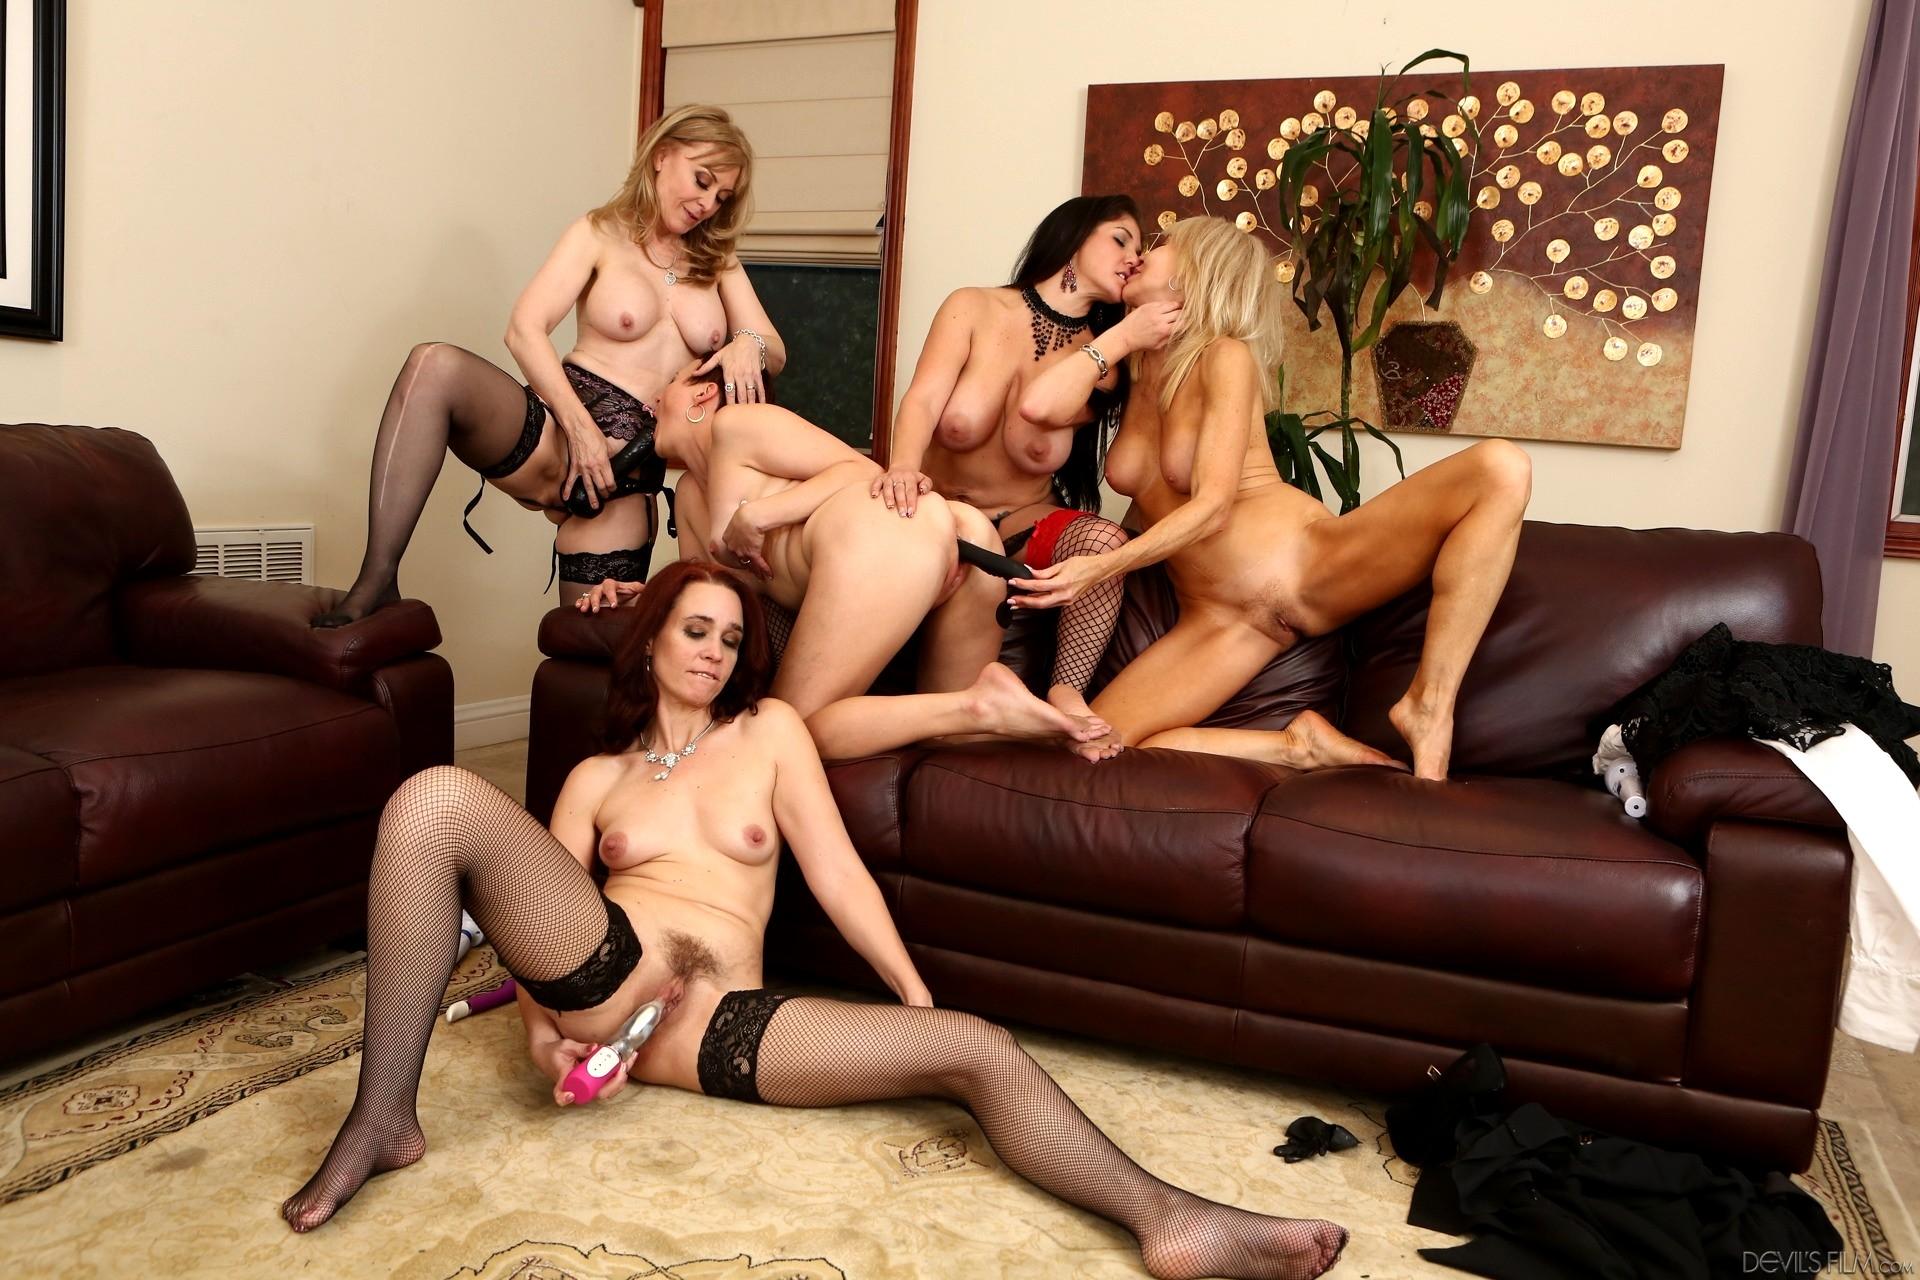 Hot girl nude massage